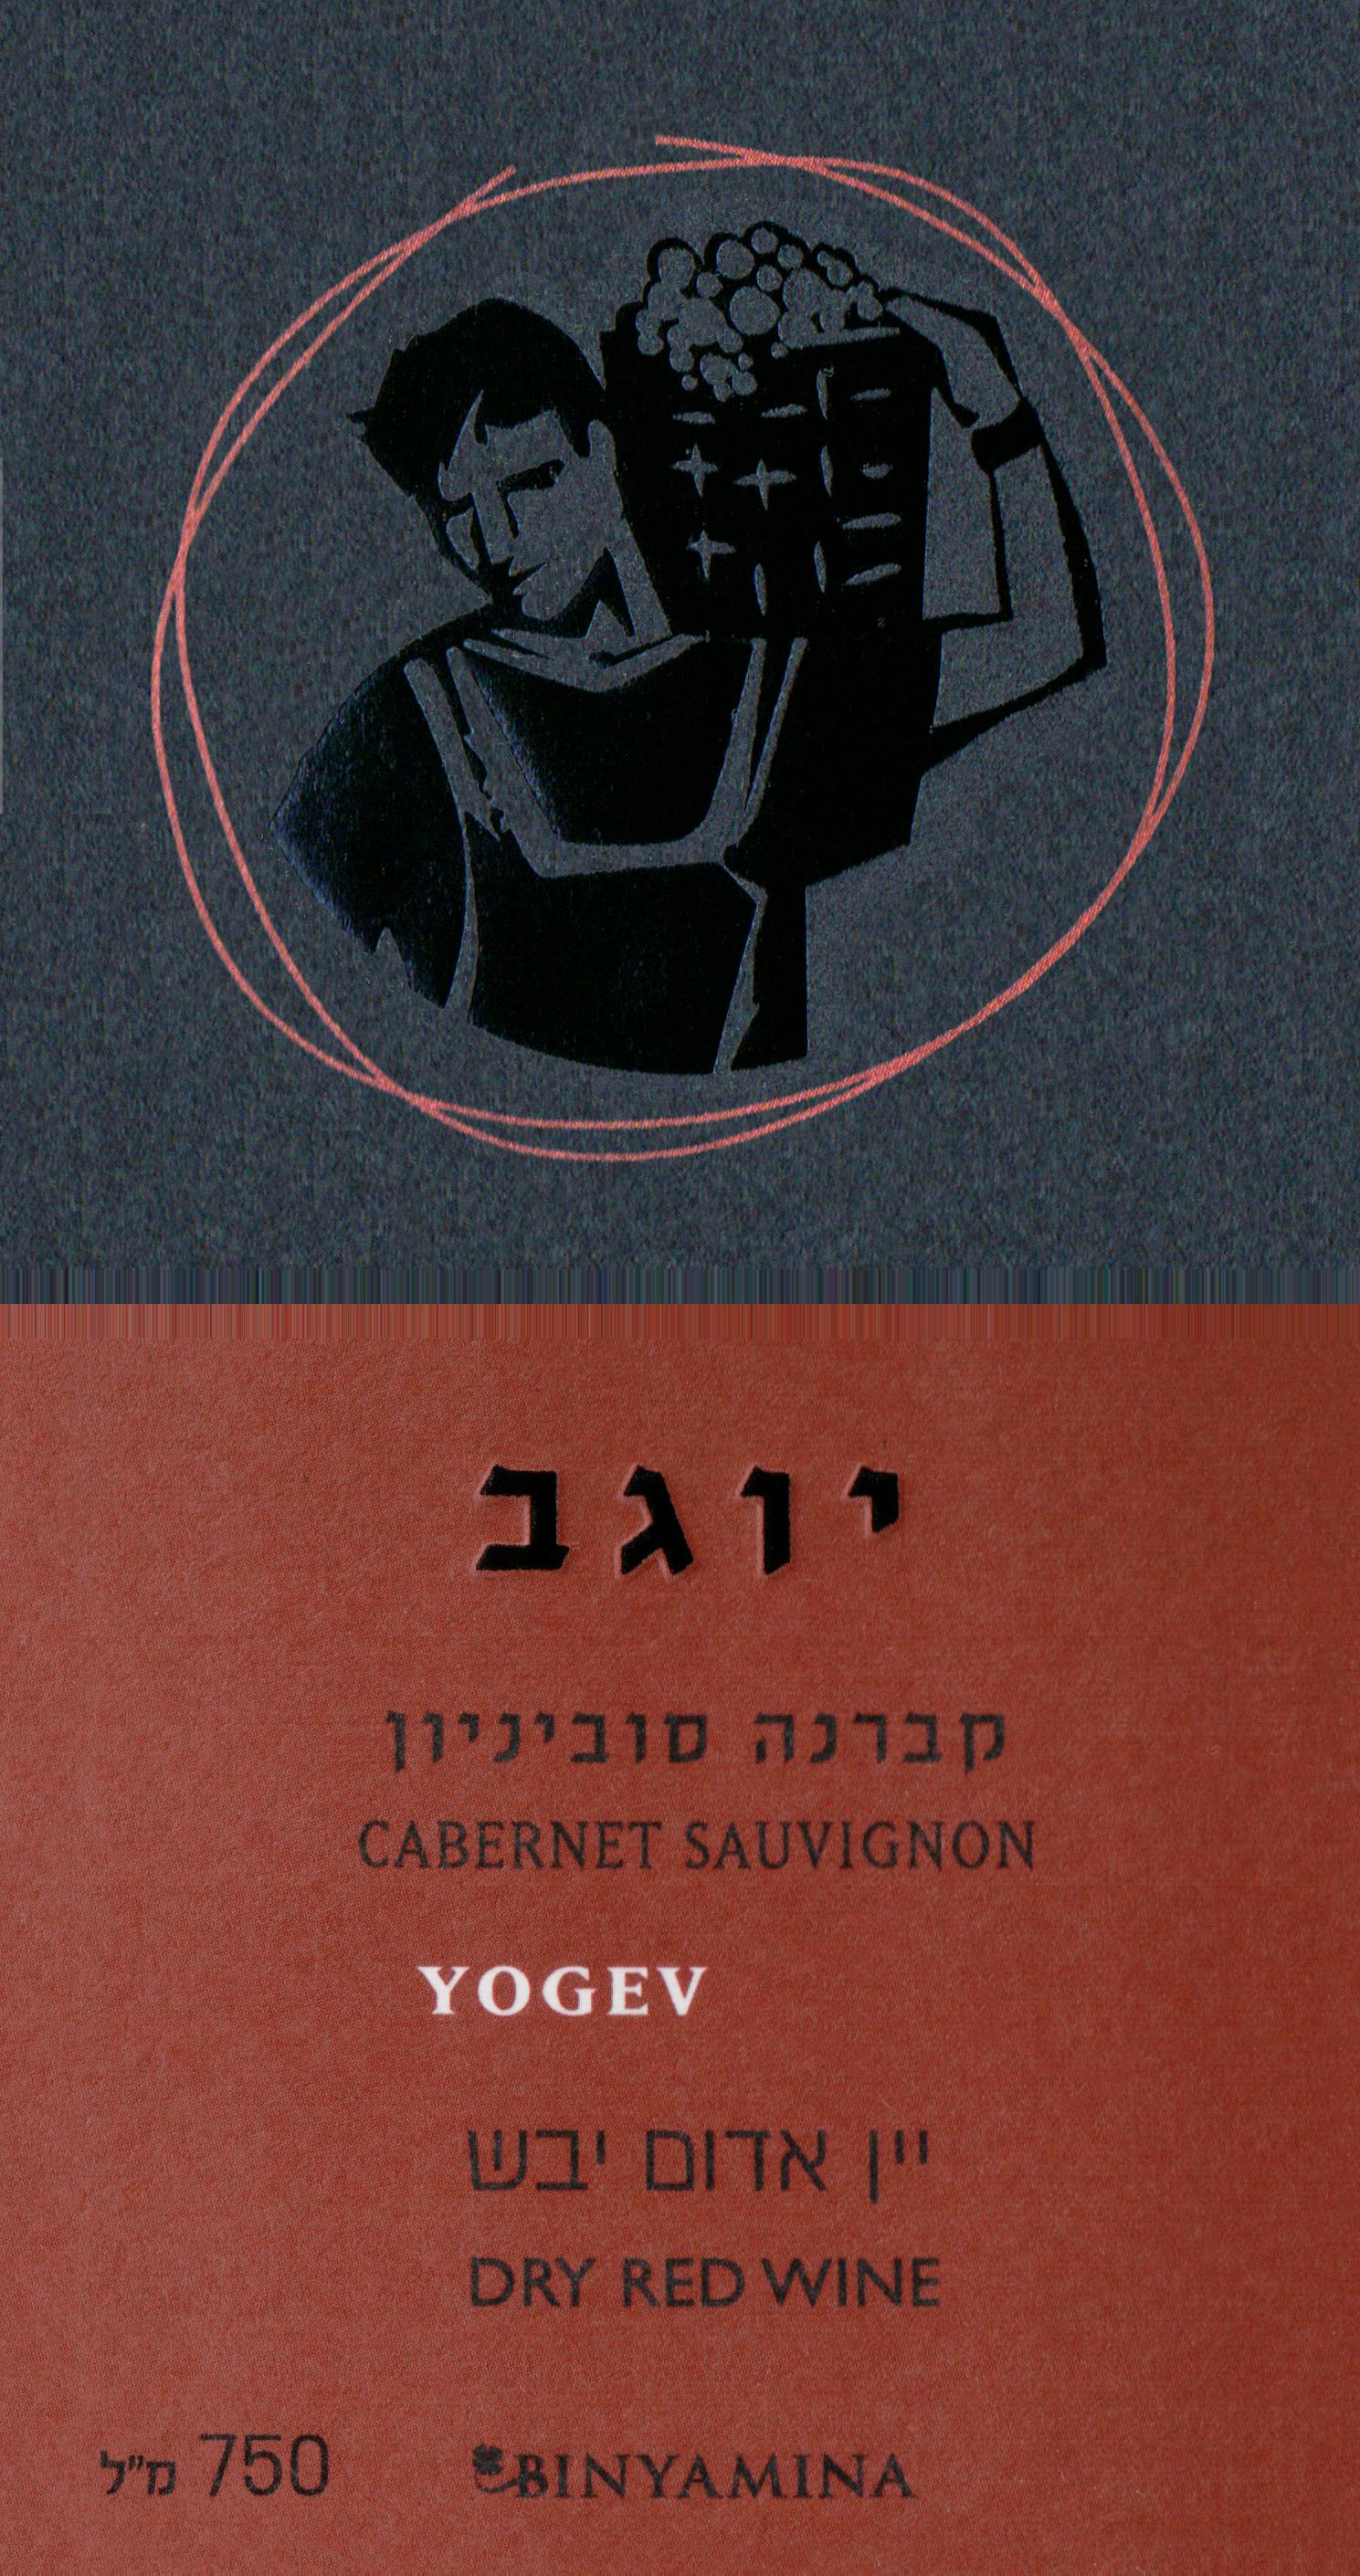 Binyamina Yogev Cabernet Sauvignon